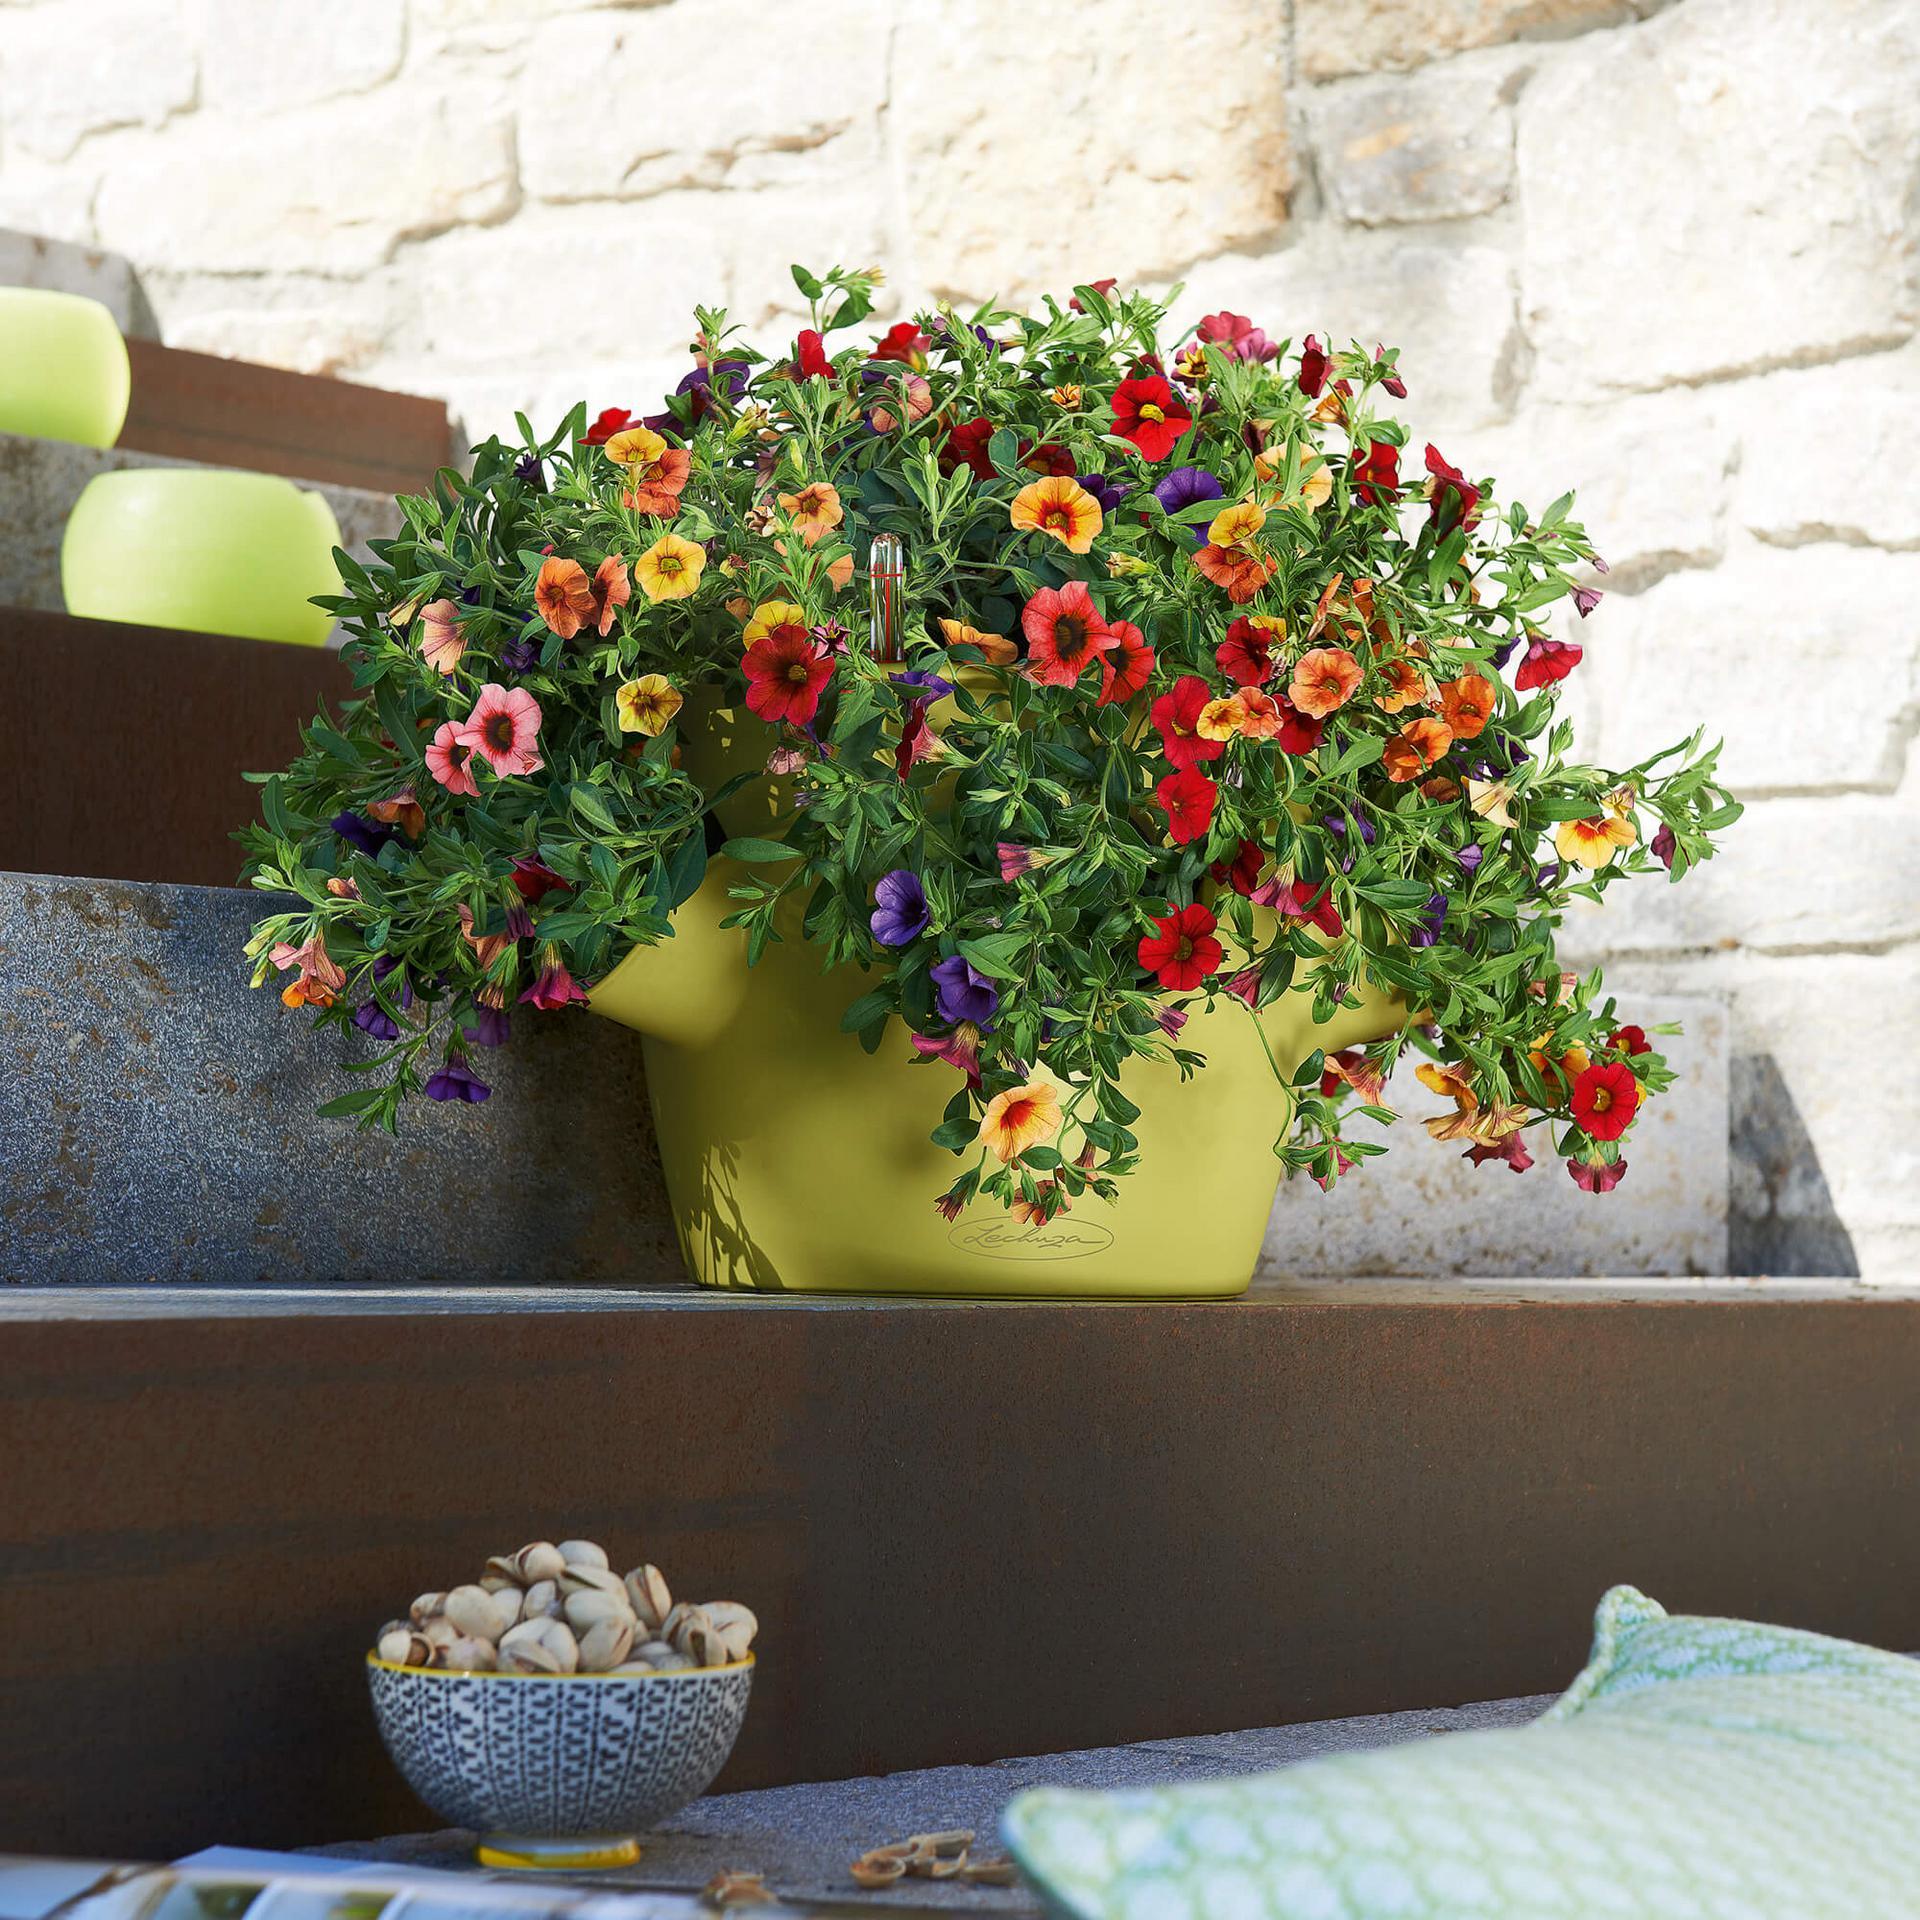 lechuza cascadino schiefergrau 36x23cm blumentopf f r kr uter. Black Bedroom Furniture Sets. Home Design Ideas